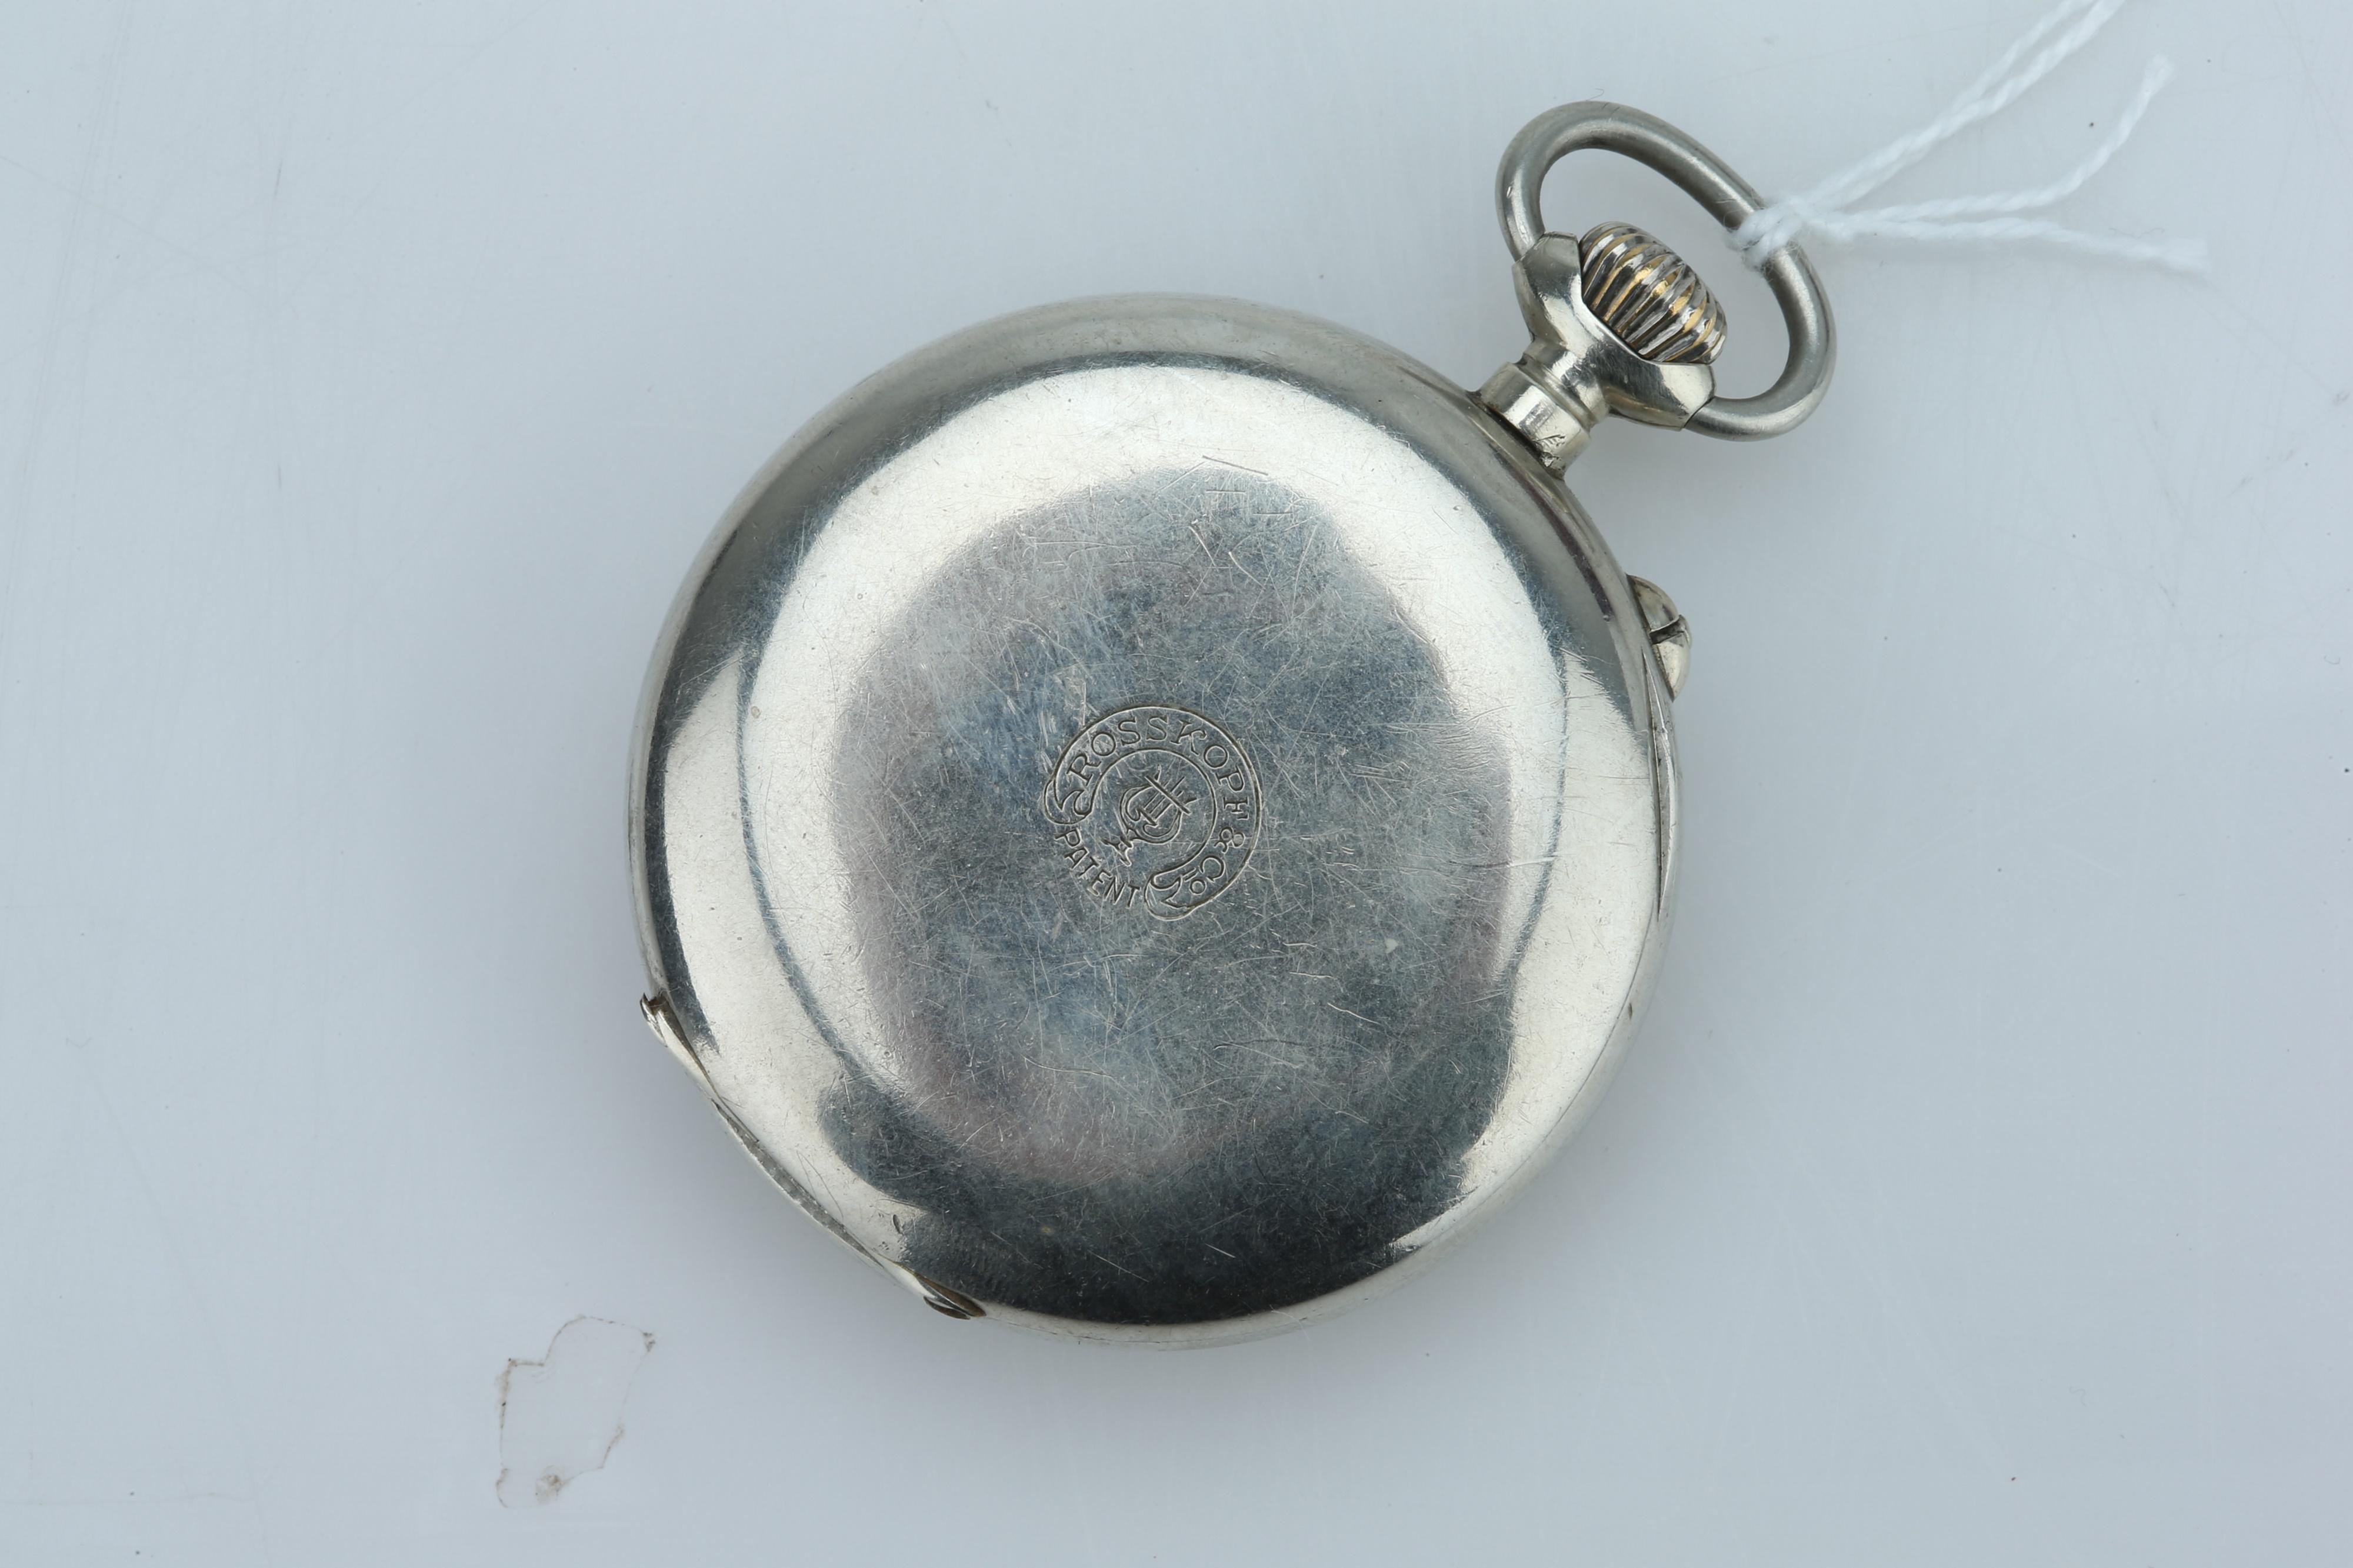 A Swiss Pocket Watch, - Image 3 of 4